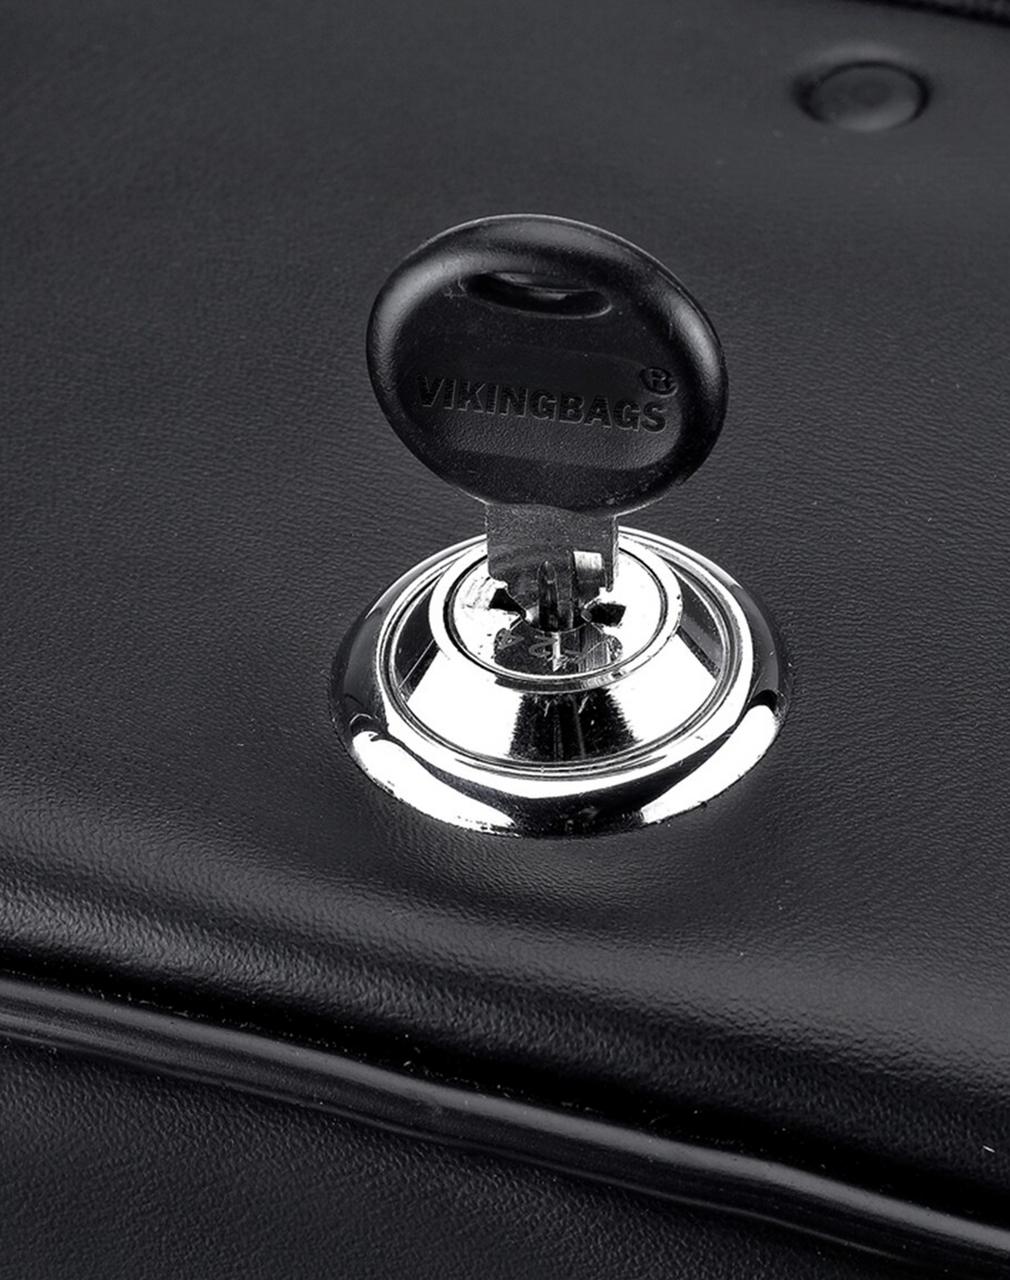 Triumph Rocket III Range Viking Shock Cutout Single Strap Large Slanted Leather Motorcycle Saddlebags Key Lock View